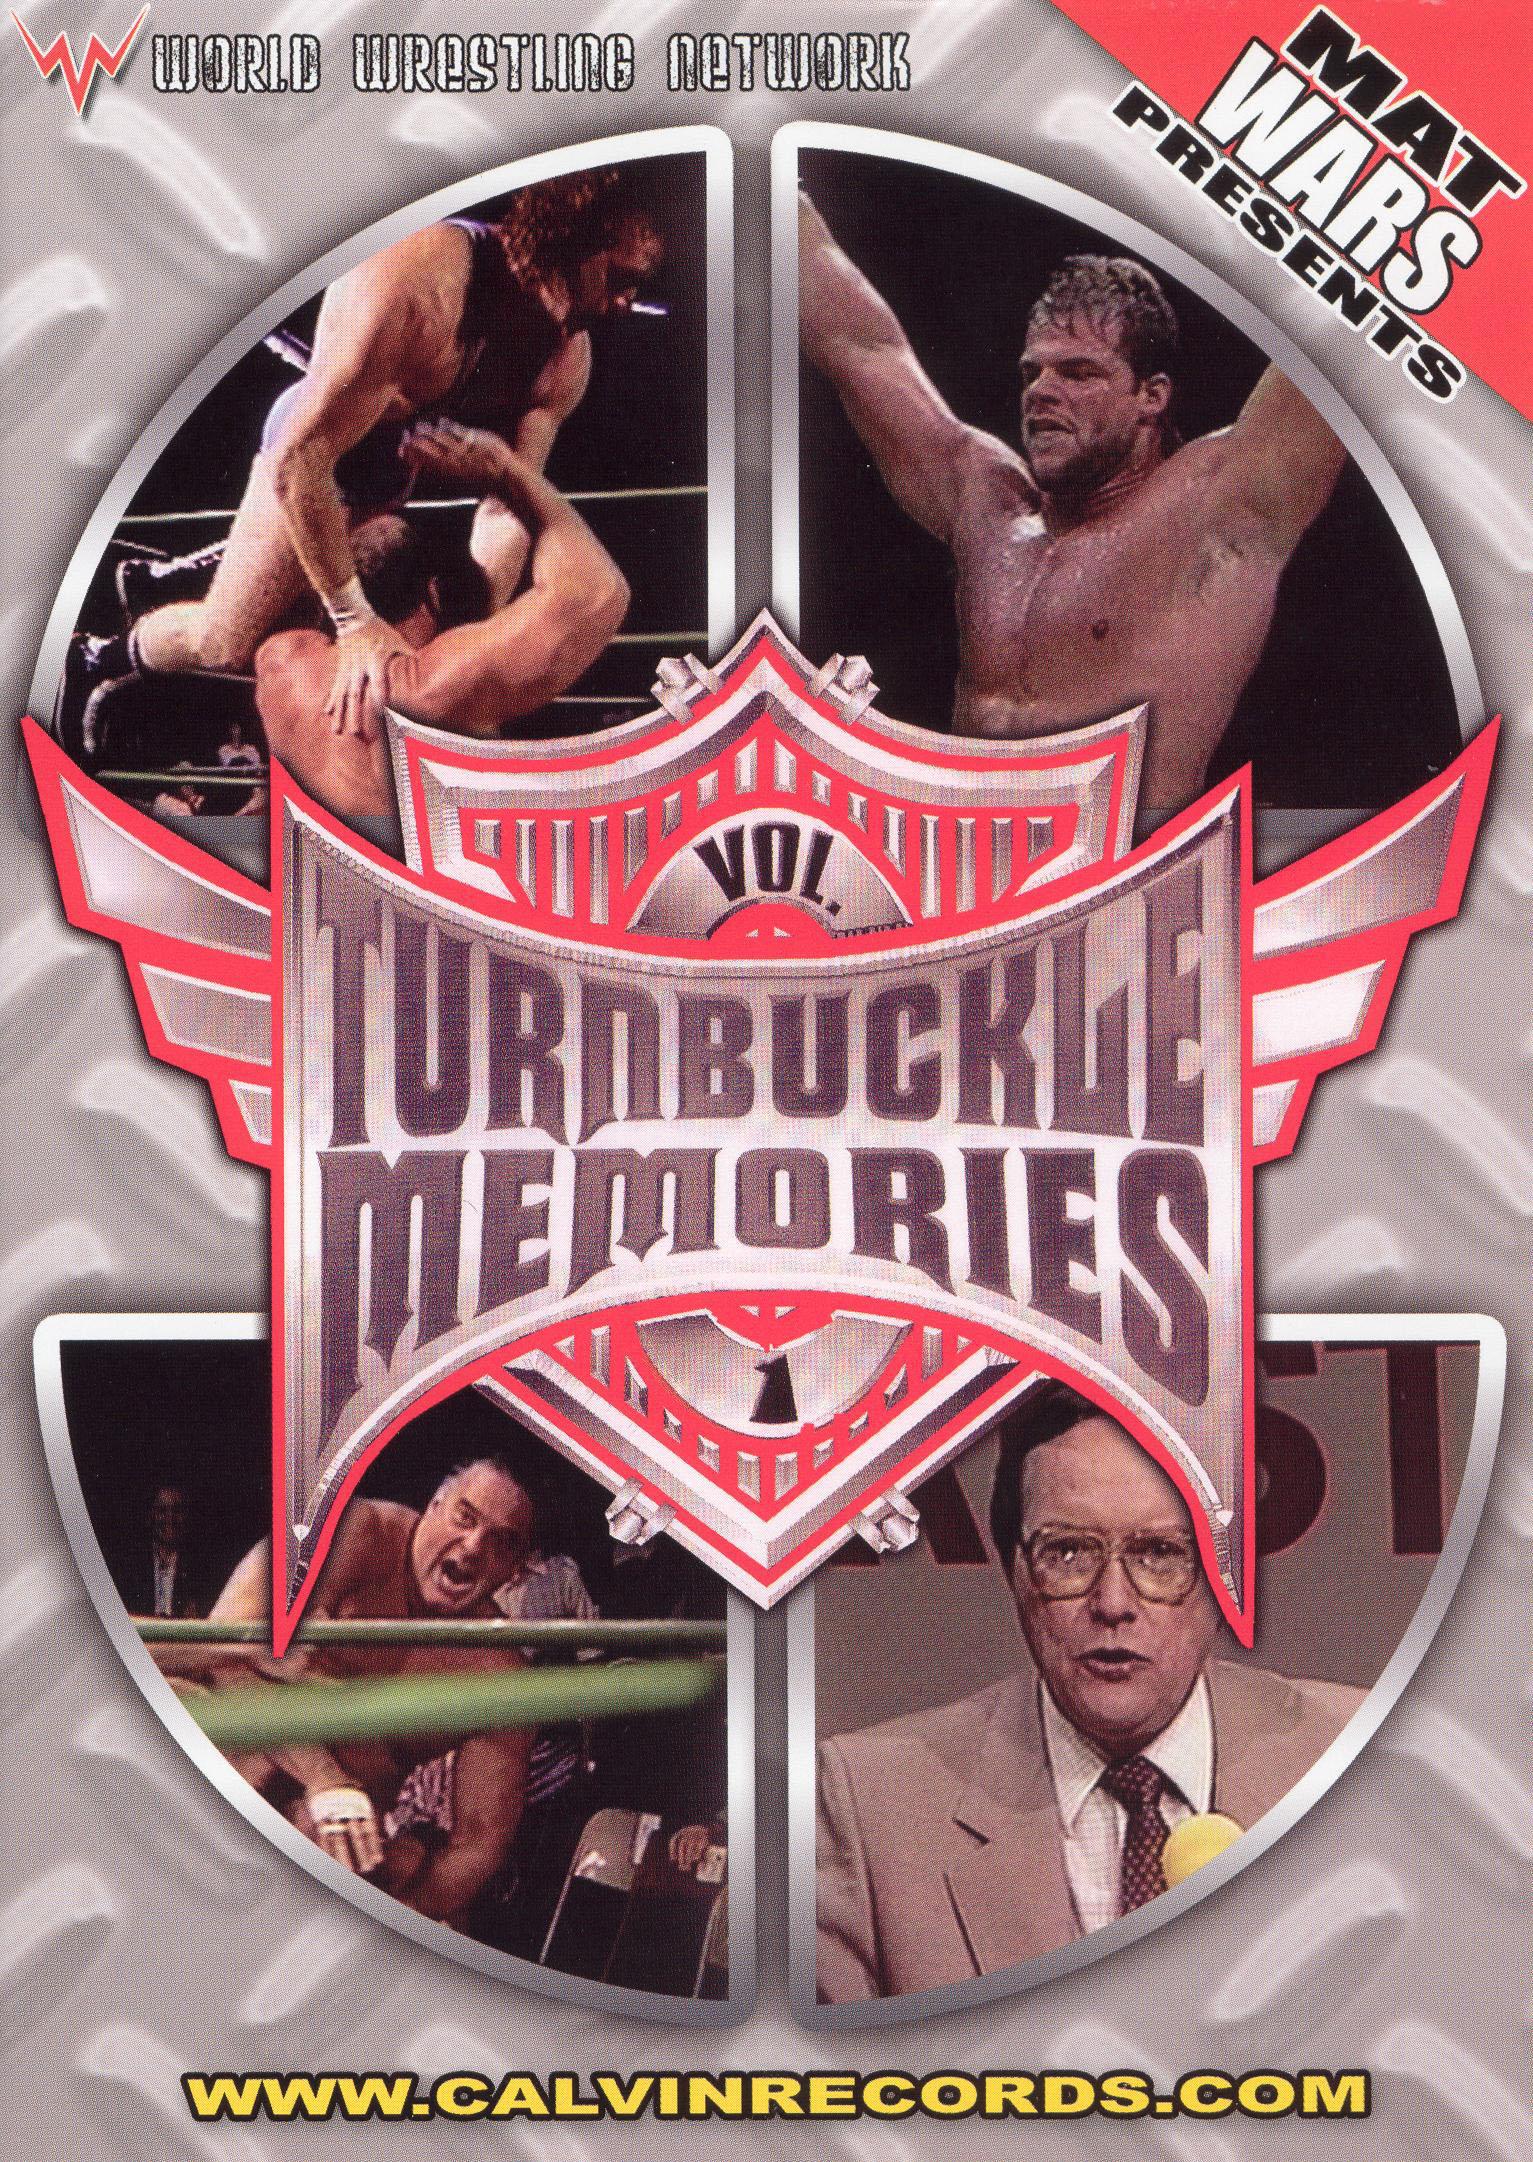 Turnbuckle Memories, Vol. 1